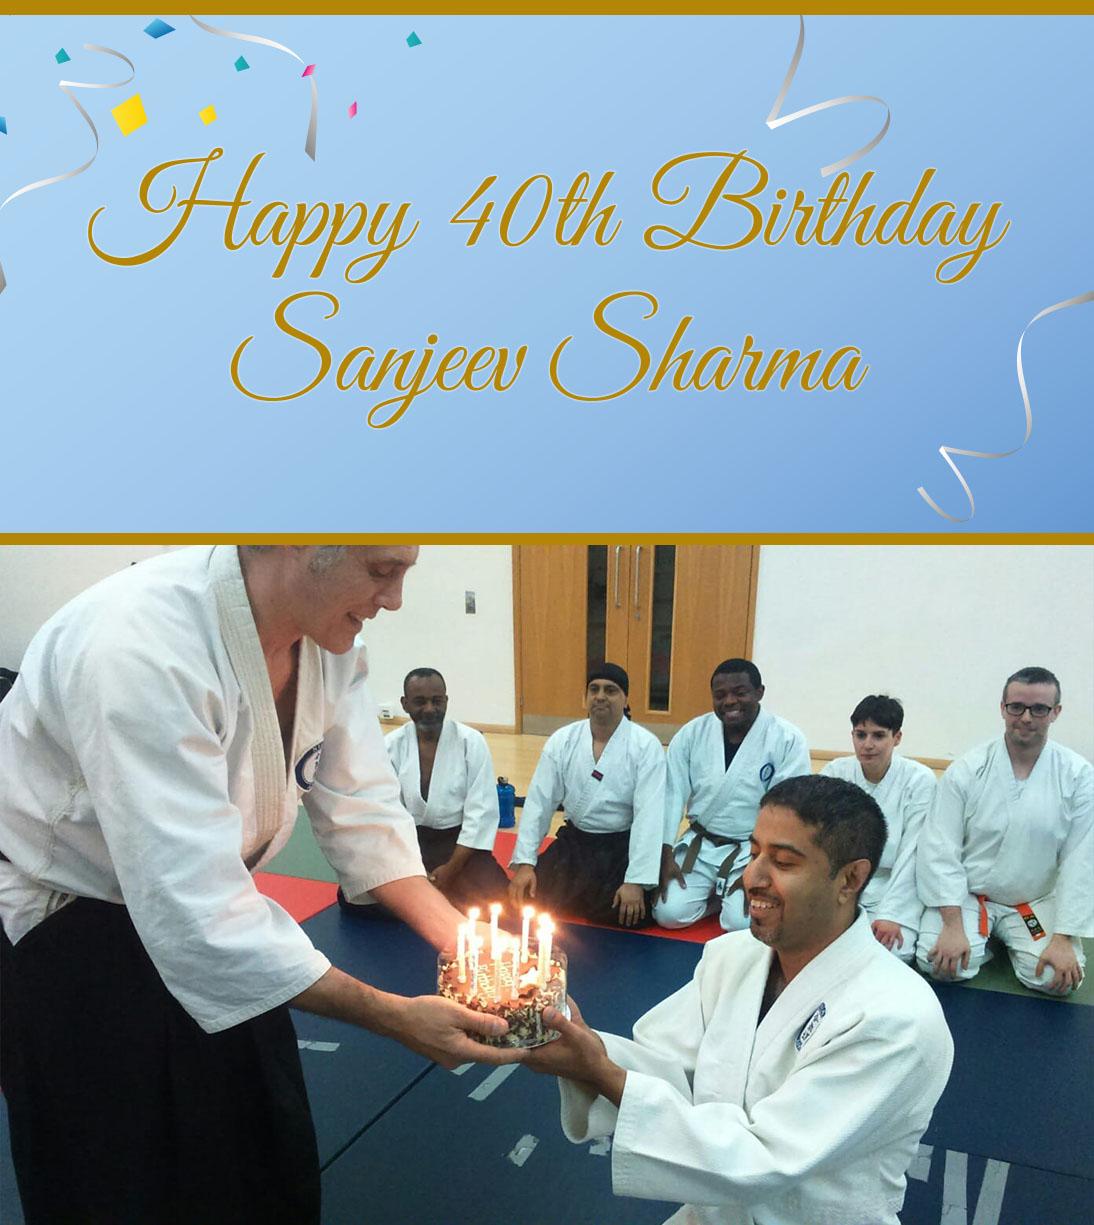 Happy 40th Birthday Sanjeev Sharma!